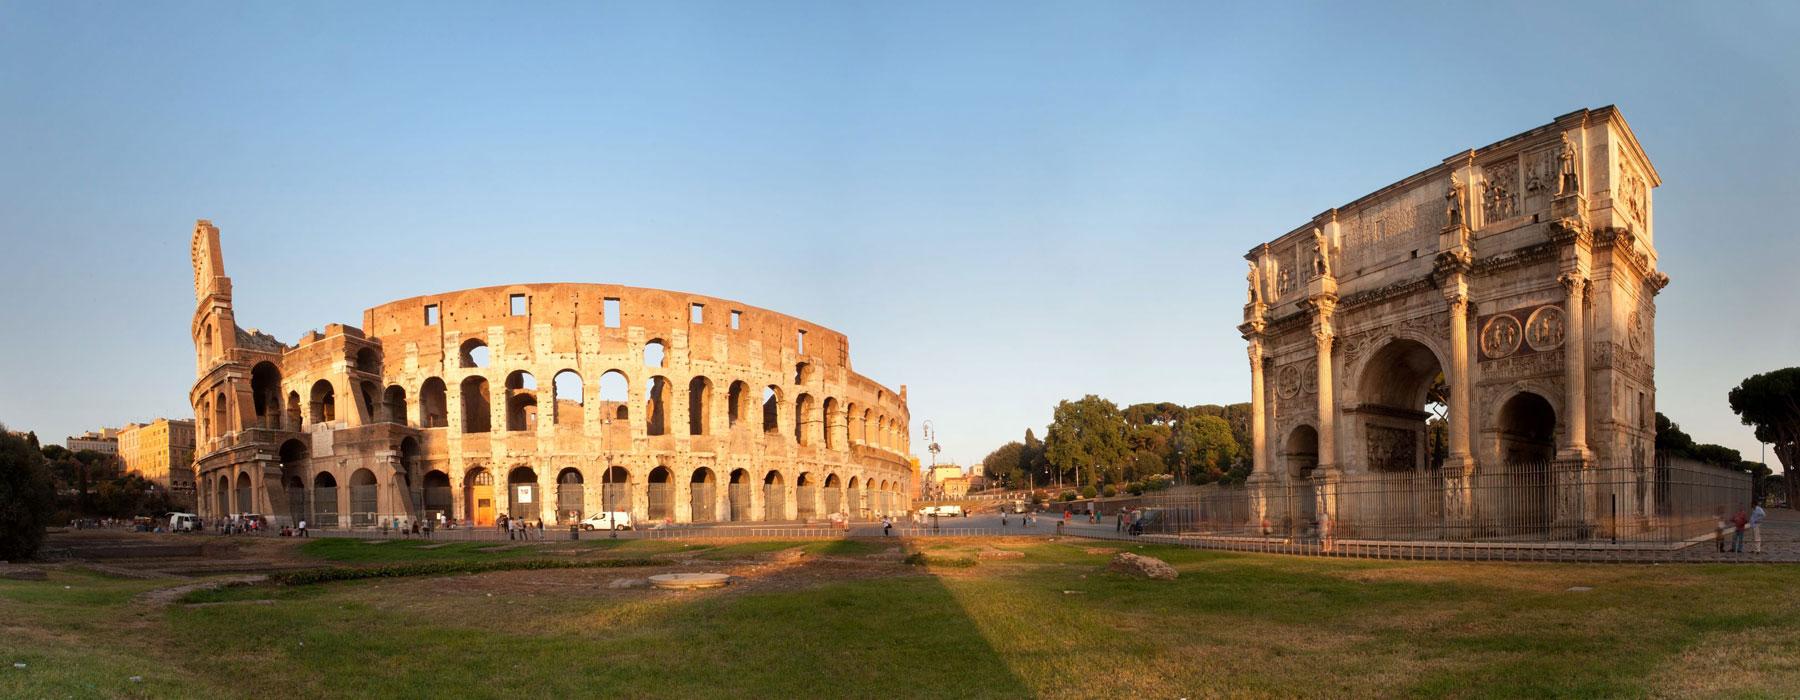 Roma_1.jpg